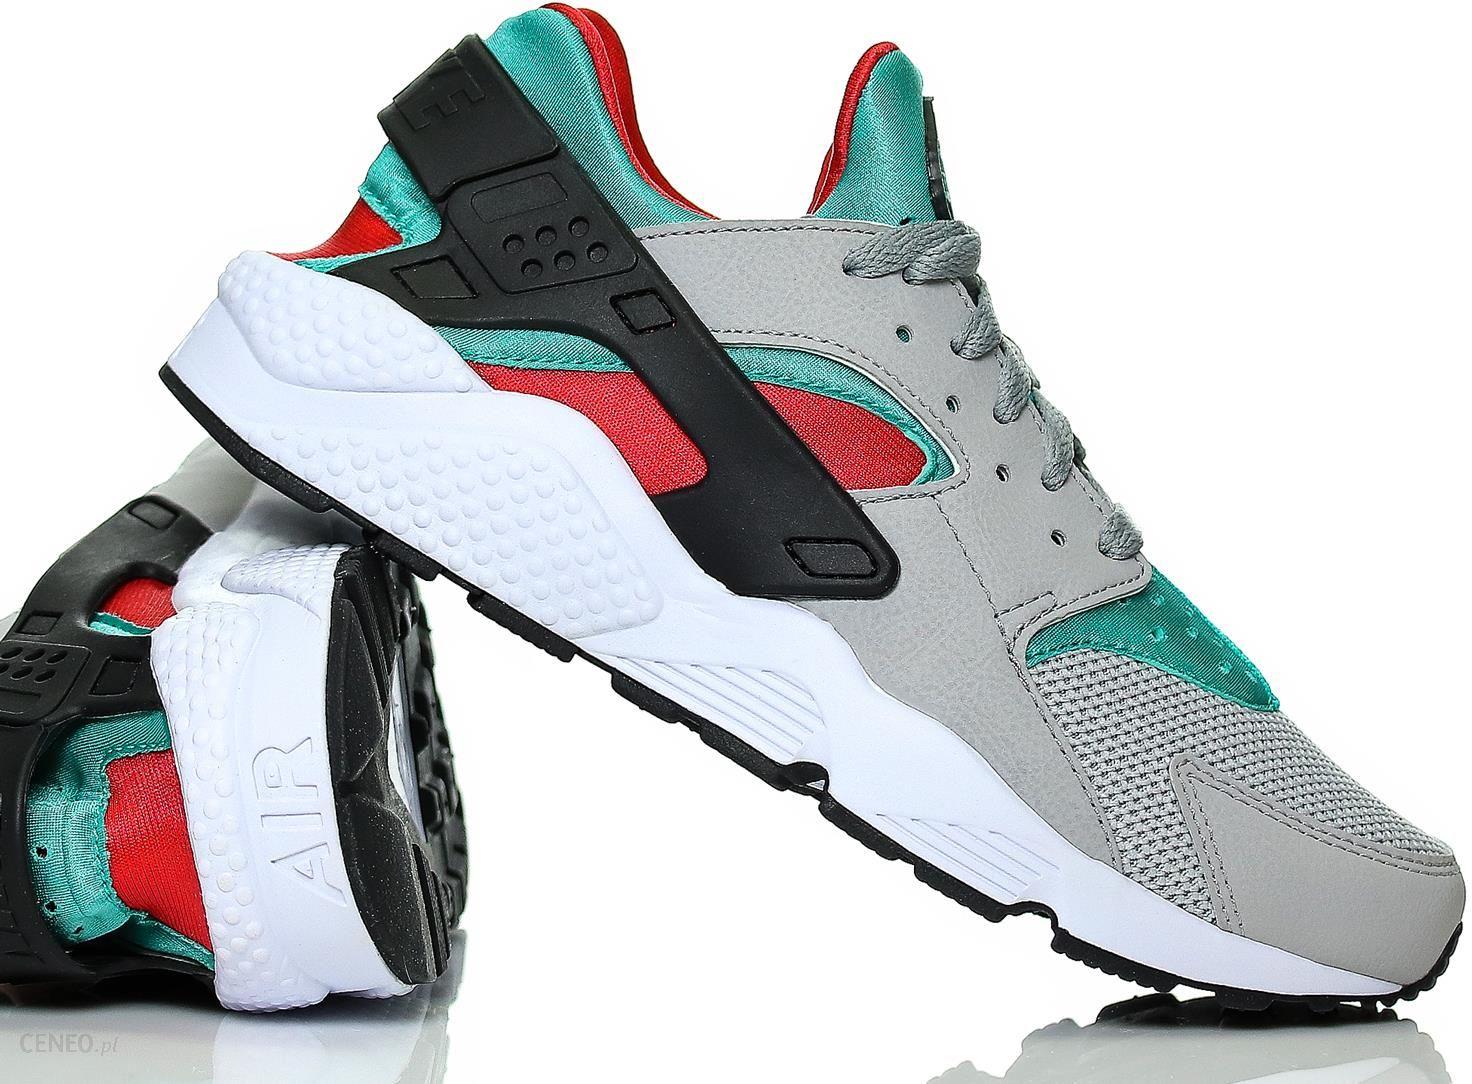 Buty męskie Nike Air Huarache 318429 023 r.42,5 Ceny i opinie Ceneo.pl